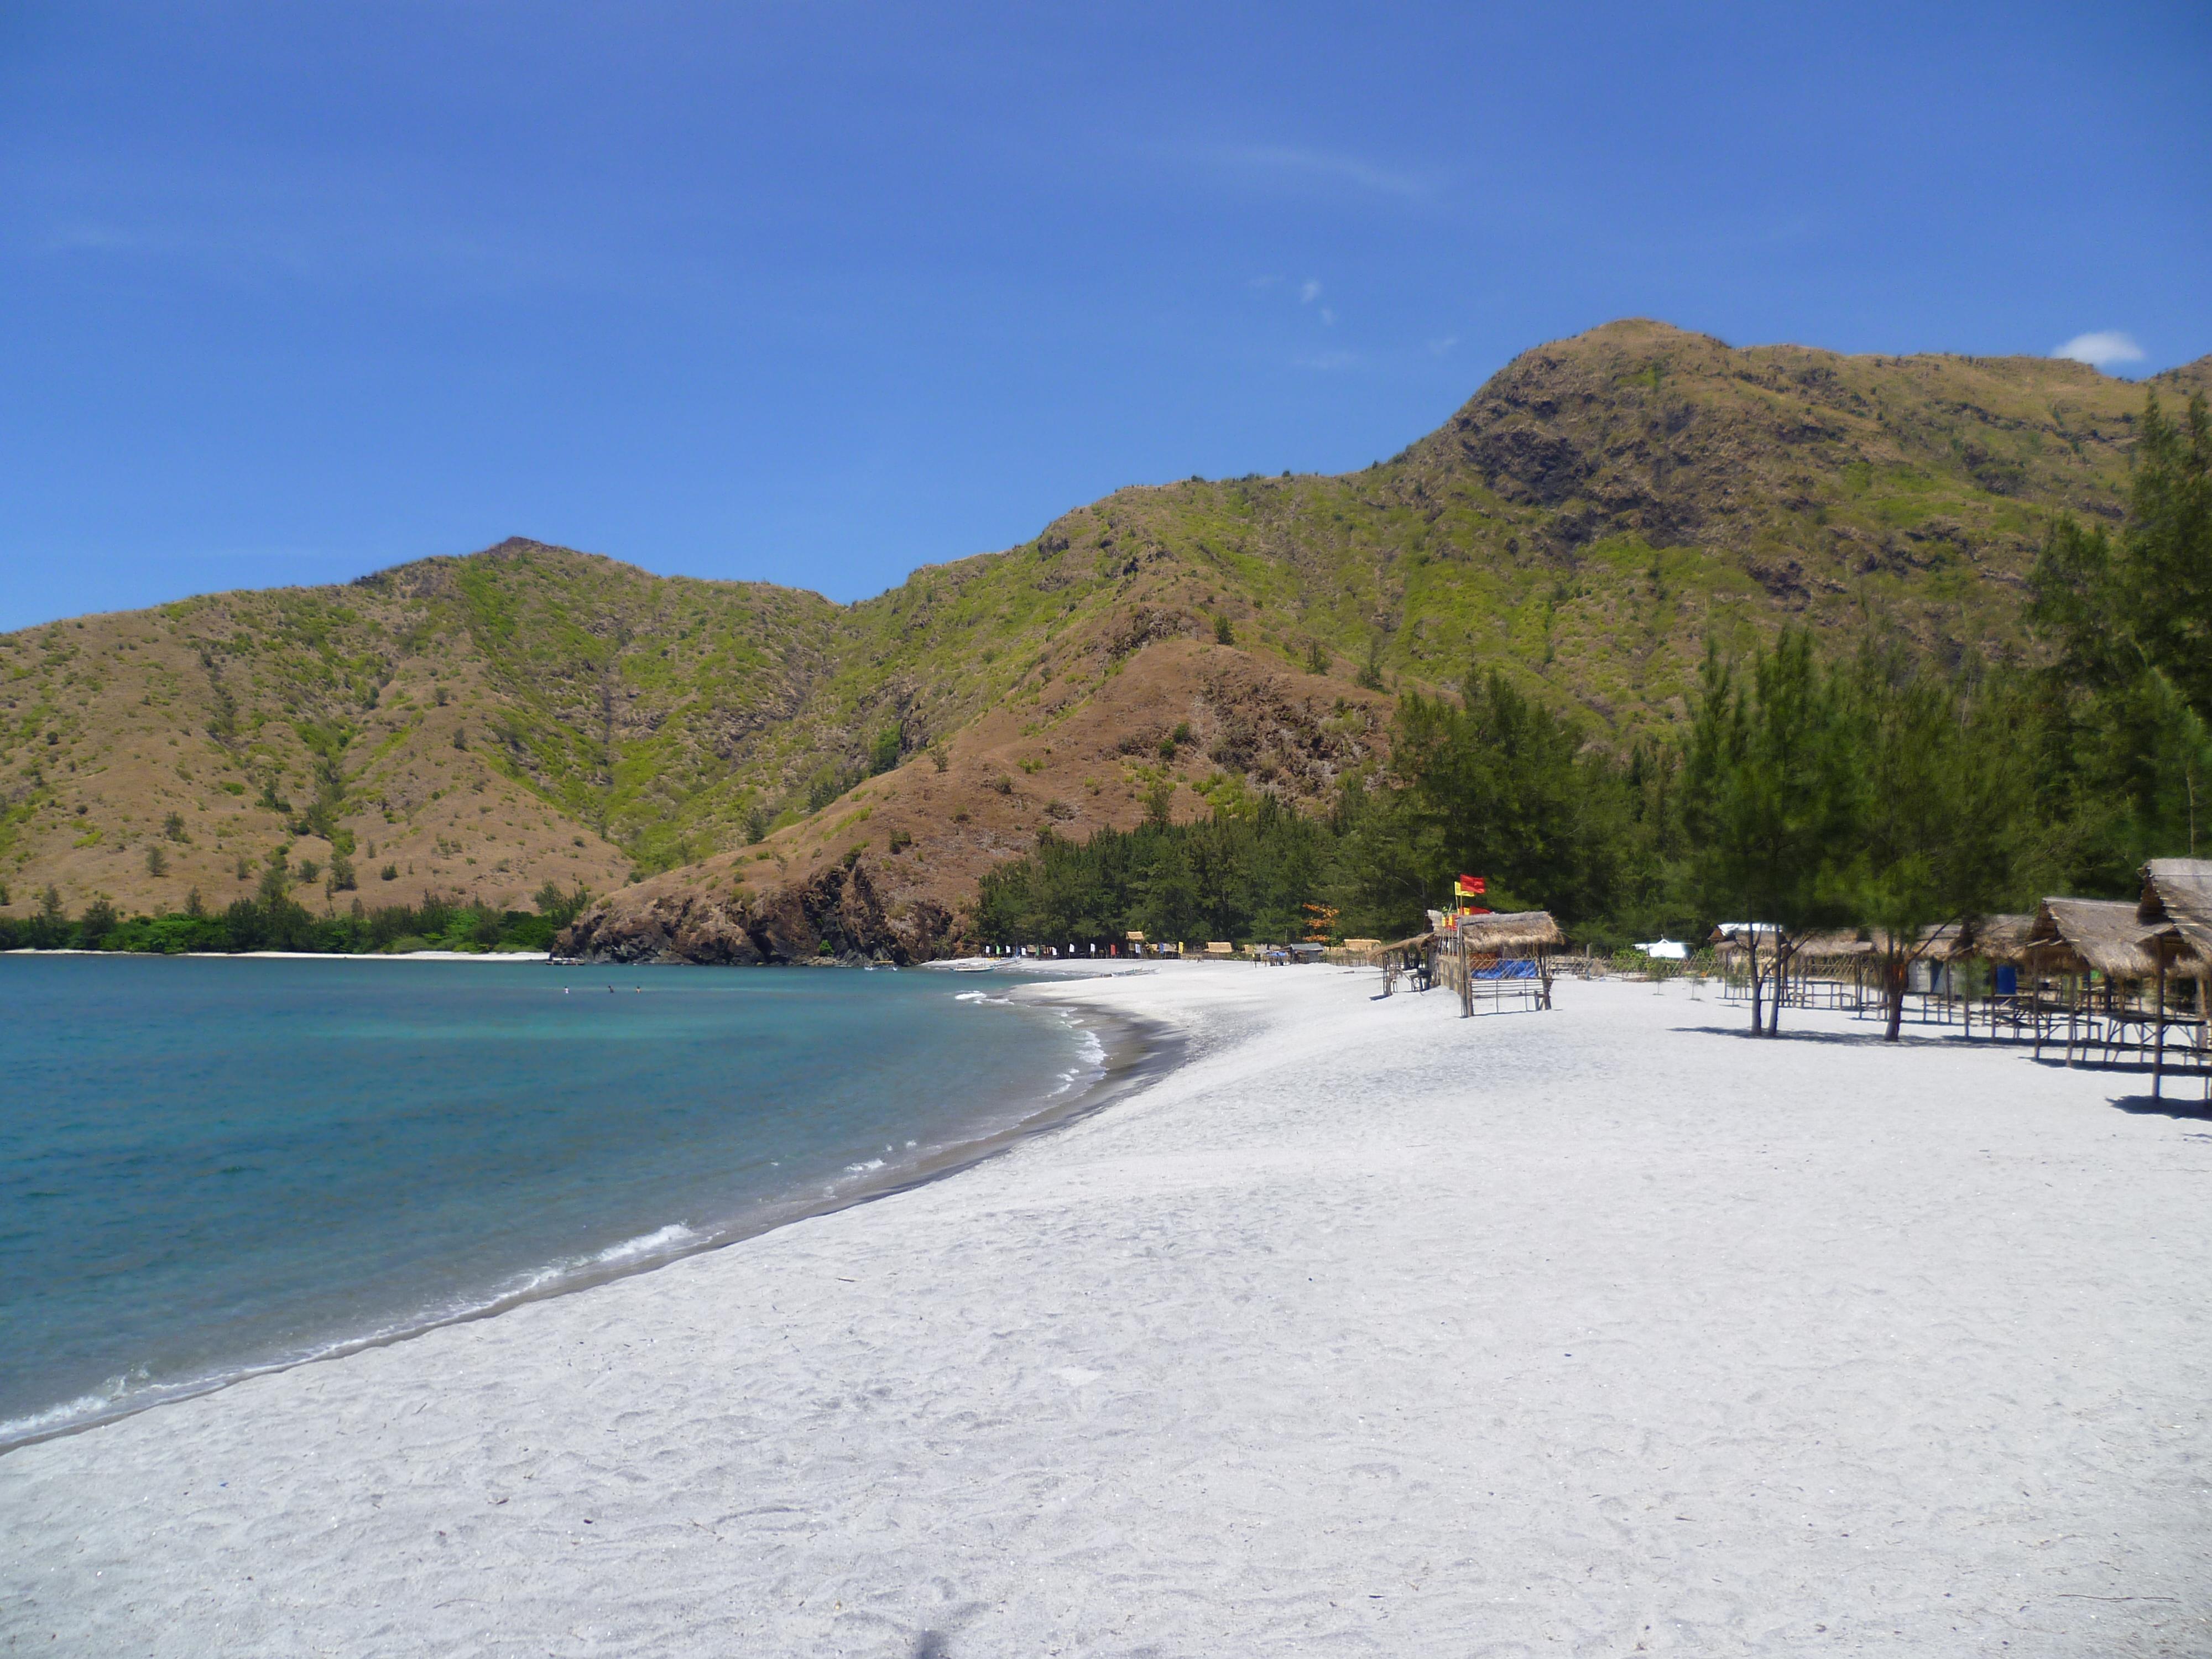 plage comme déserte: Anawanguin cove